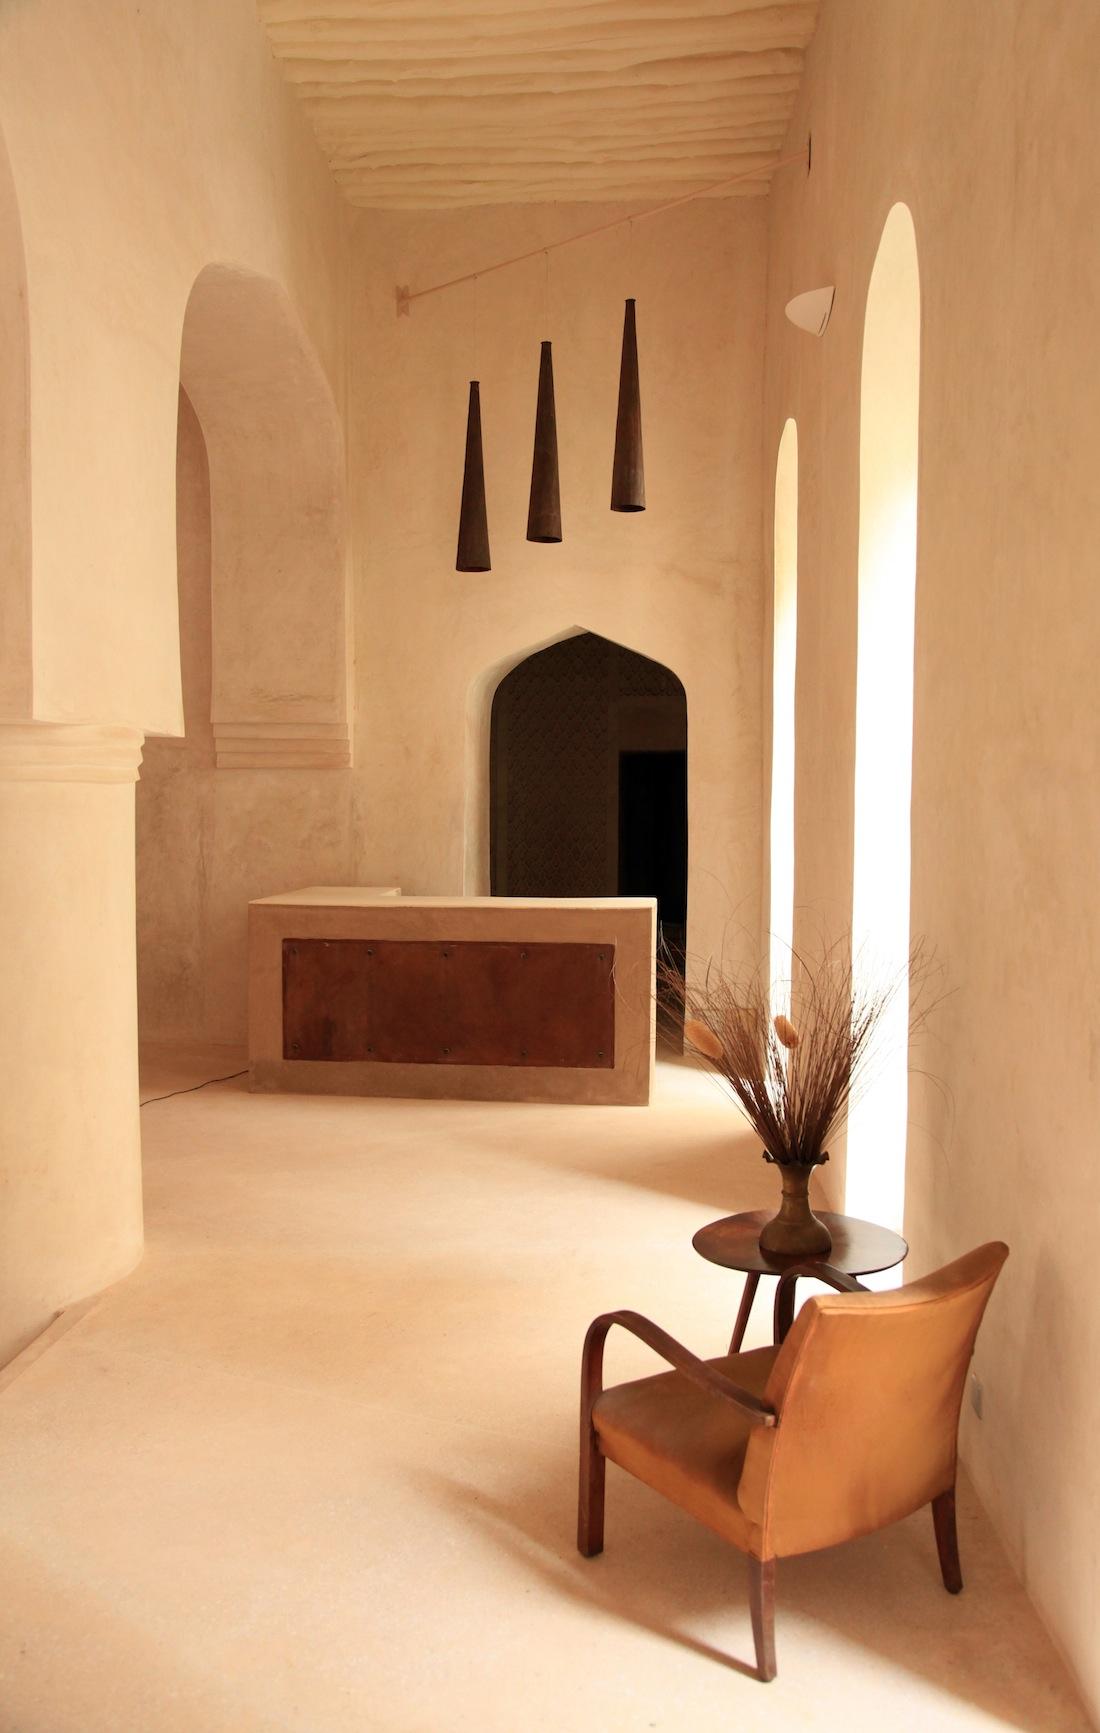 Mashariki-palace-hotel-zanzibar-stone-town-chambres-rooms-07